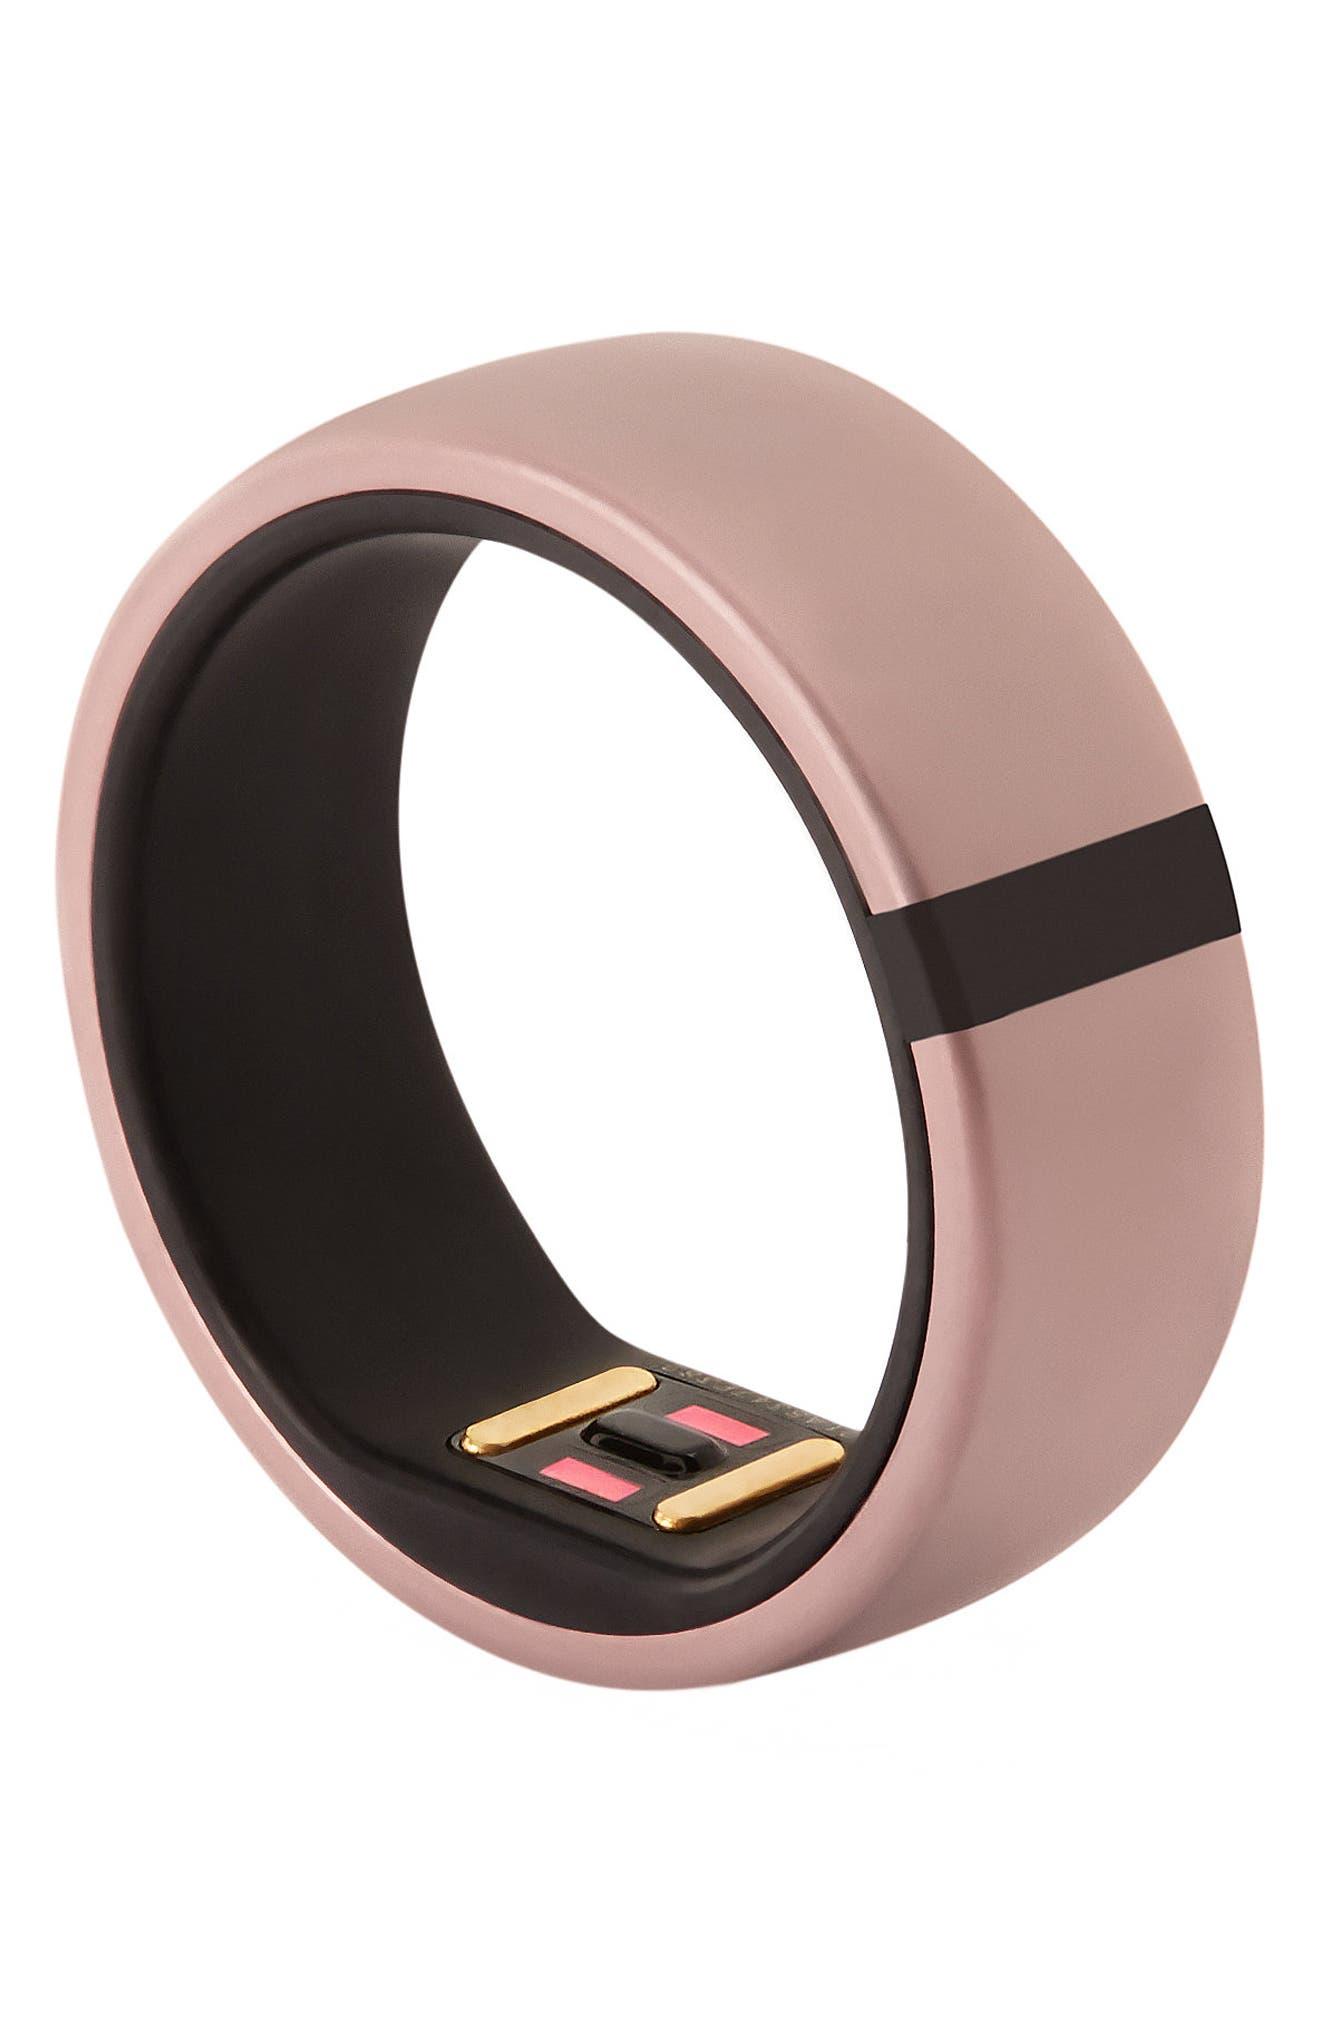 Fitness & Sleep Tracking Ring,                             Alternate thumbnail 5, color,                             650